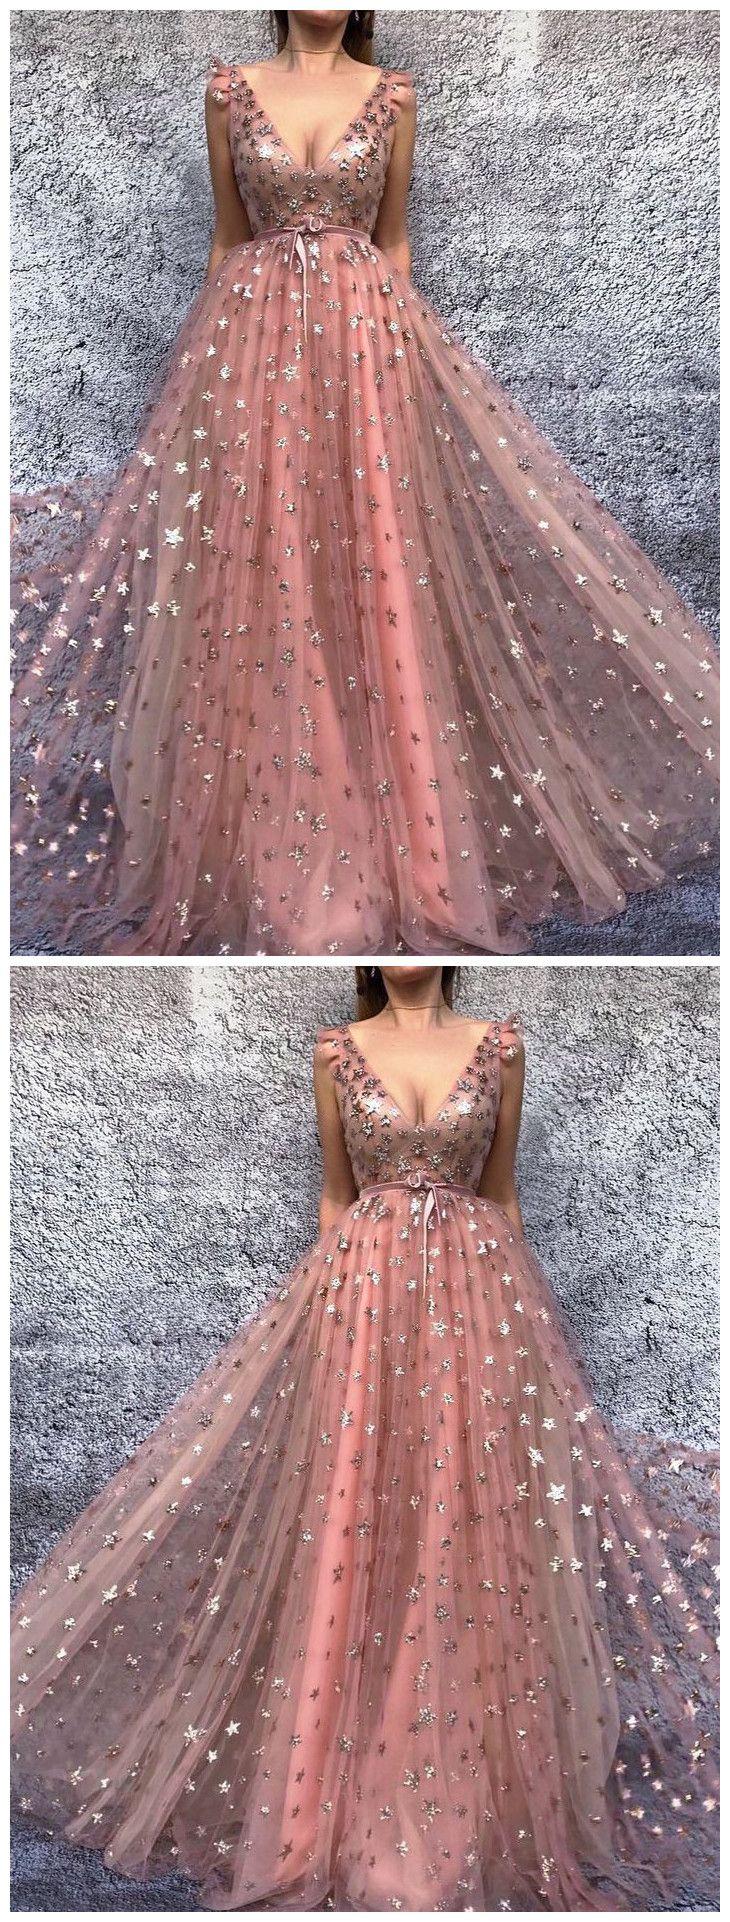 chic aline v neck prom dresses pink long prom dress evening